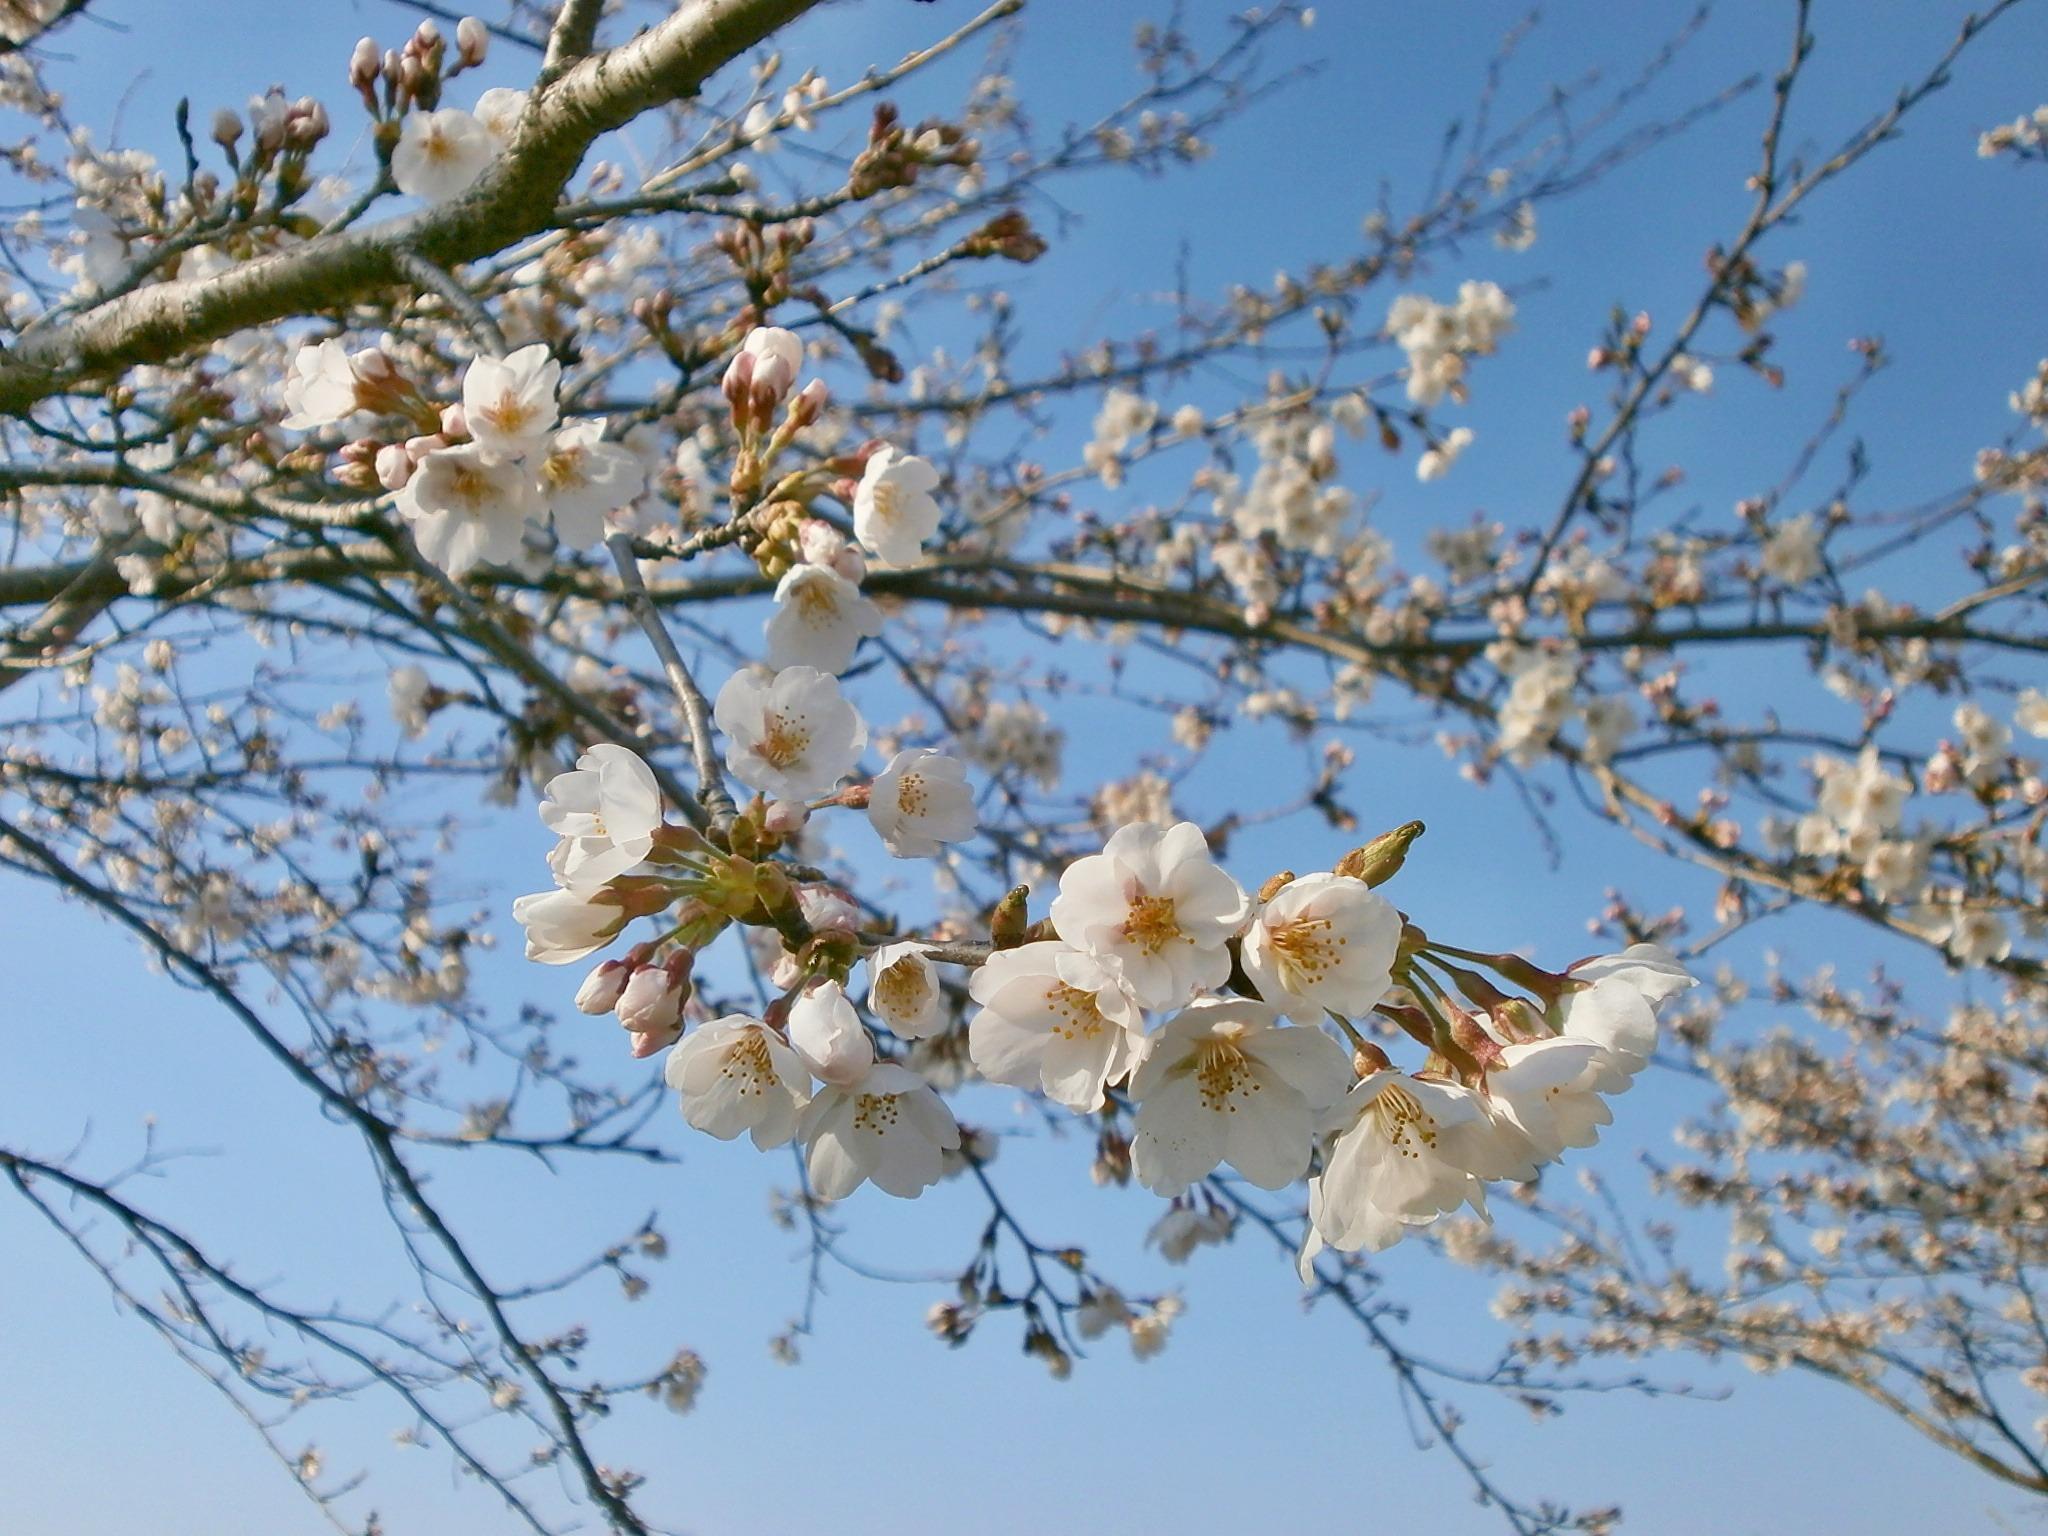 процессе заливки весенние цветущие деревья фото и названия предлагаем как